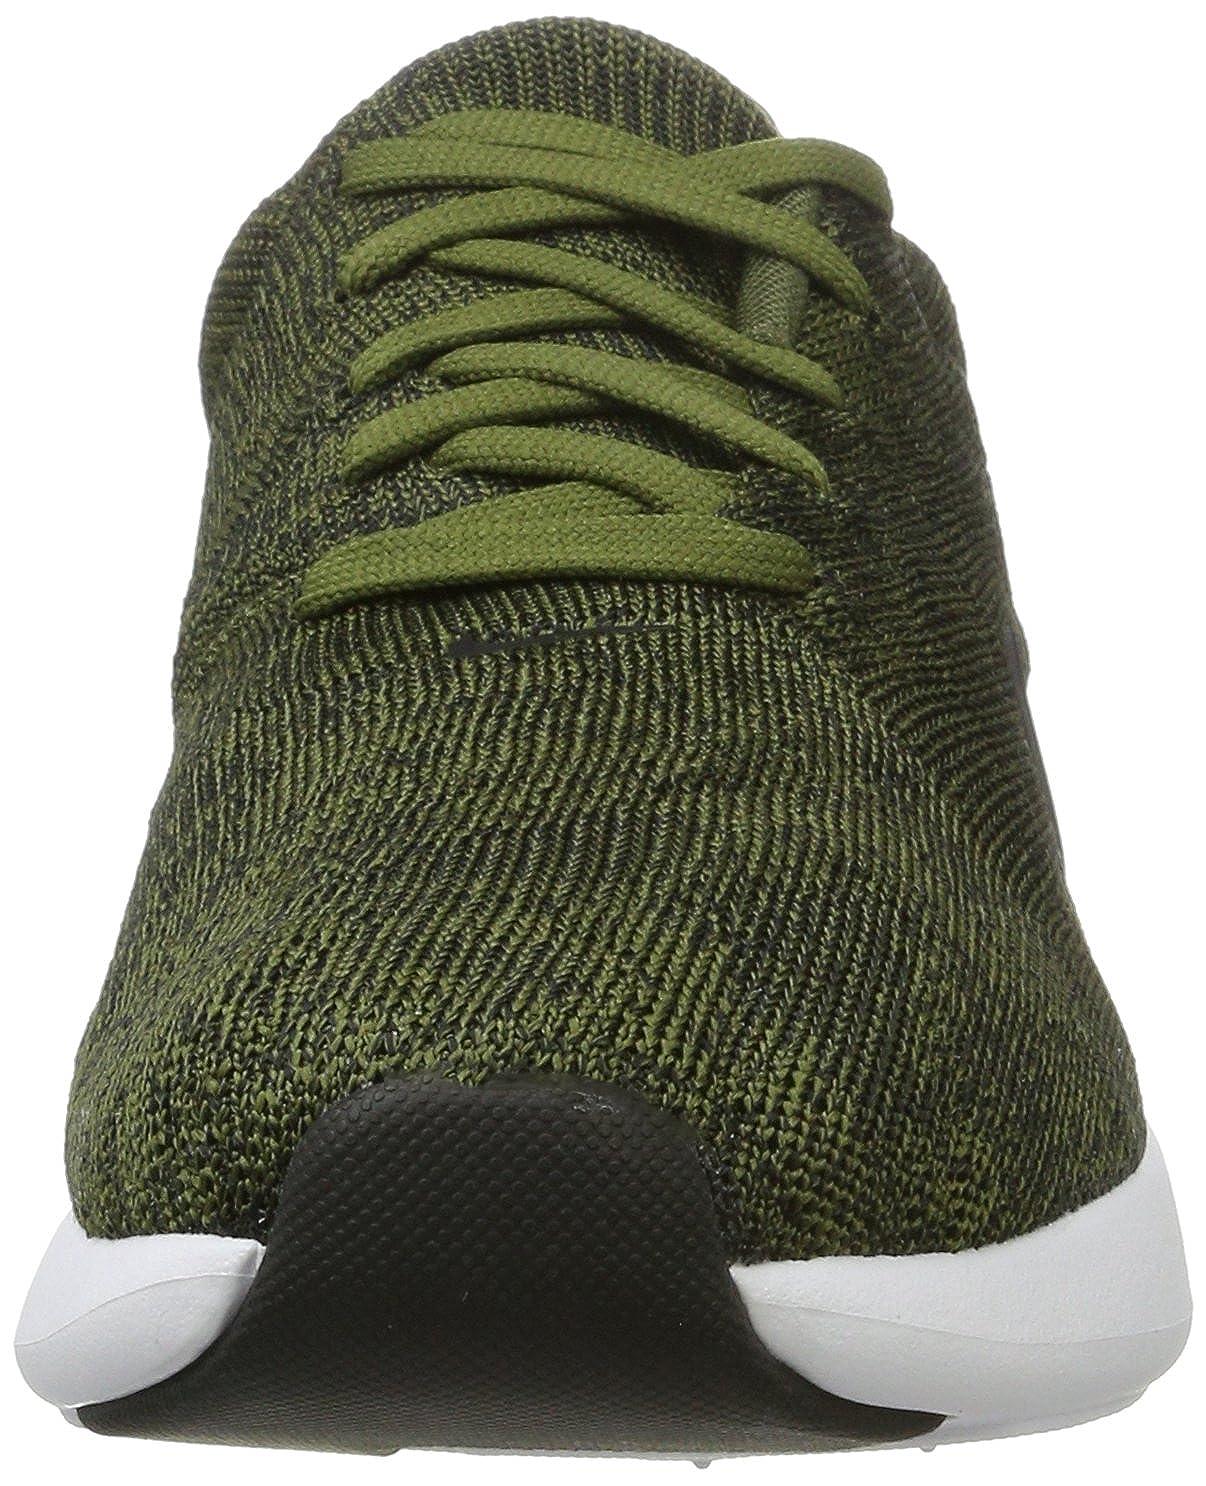 2c6f18957c8 Nike Air Max Modern Flyknit Men's Running, Rough Green/Black-White, 11